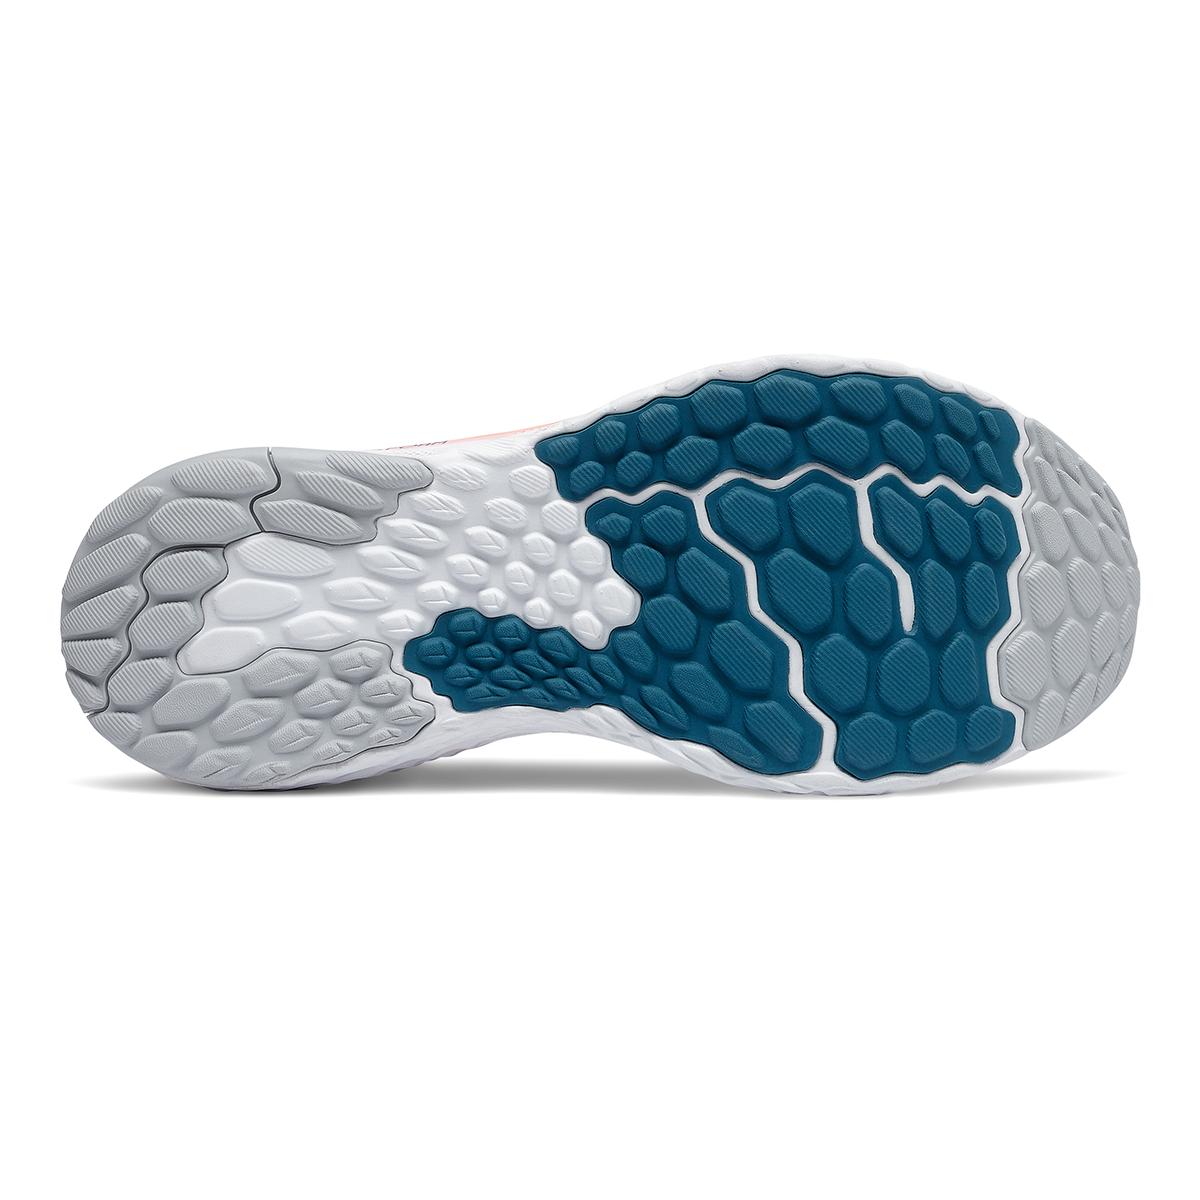 Men's New Balance Fresh Foam 1080v10 Running Shoe - Color: Light Blue - Size: 7 - Width: Regular, Light Blue, large, image 4